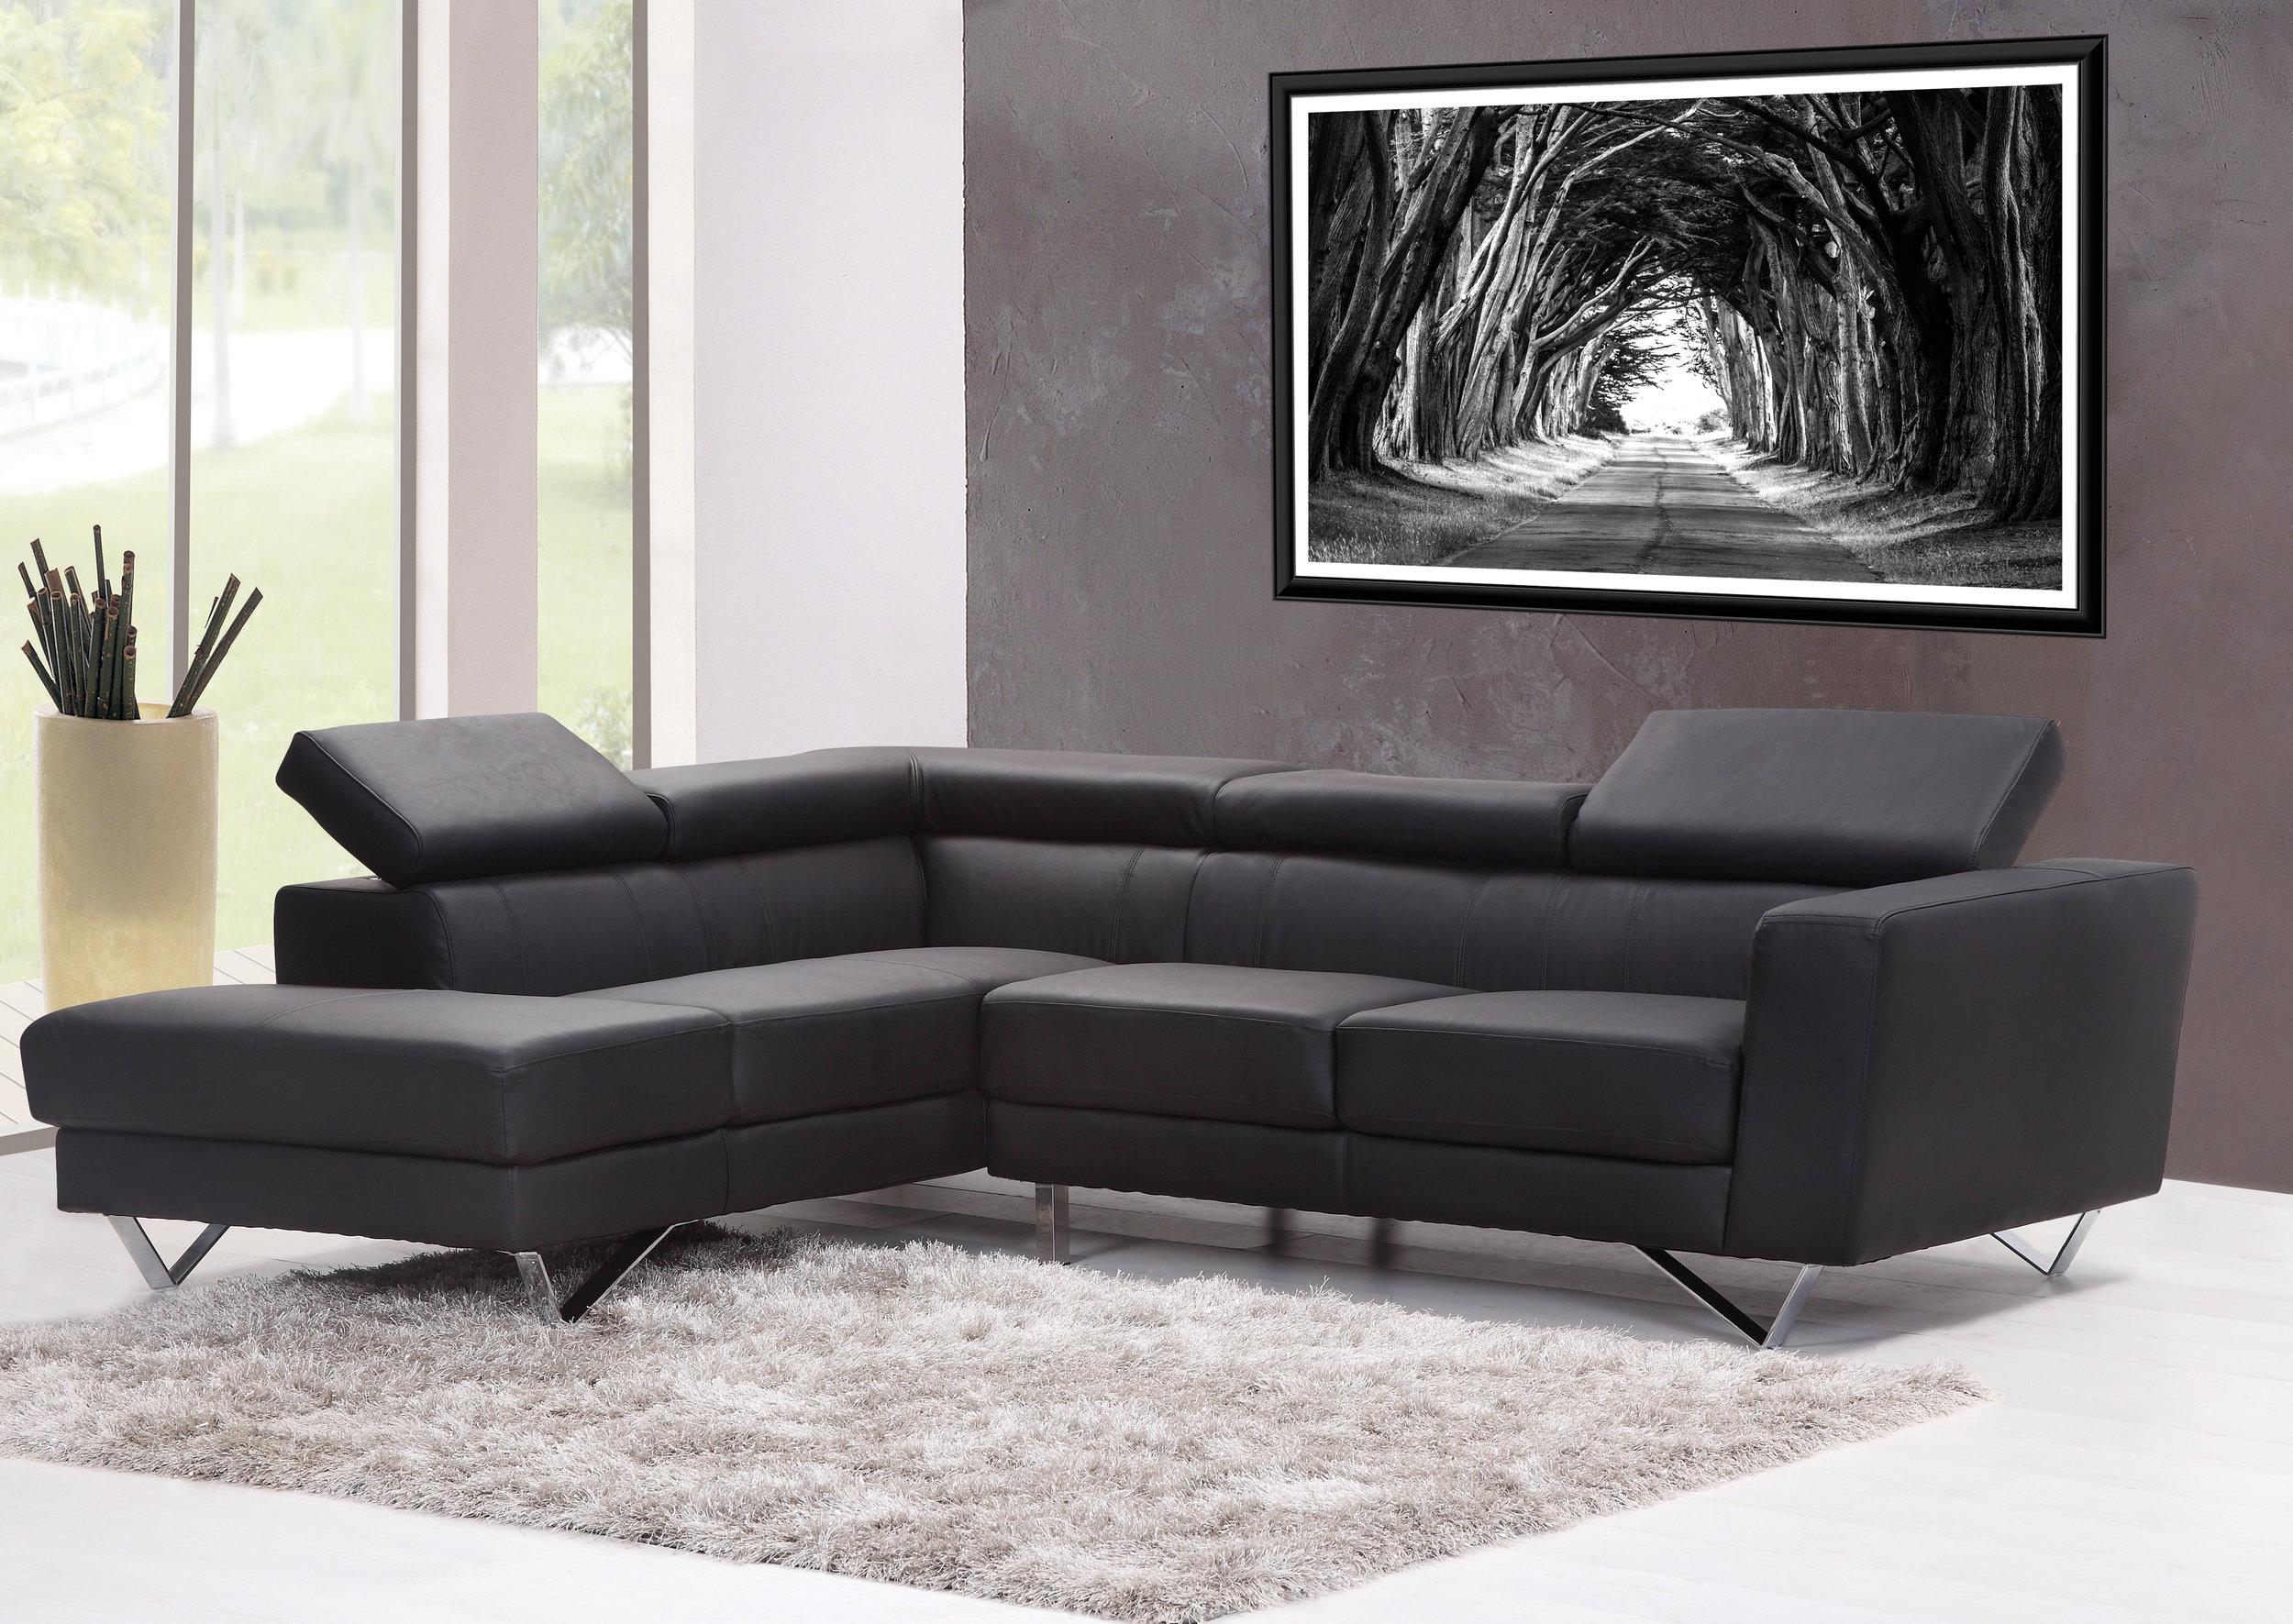 Black couch living room.jpg